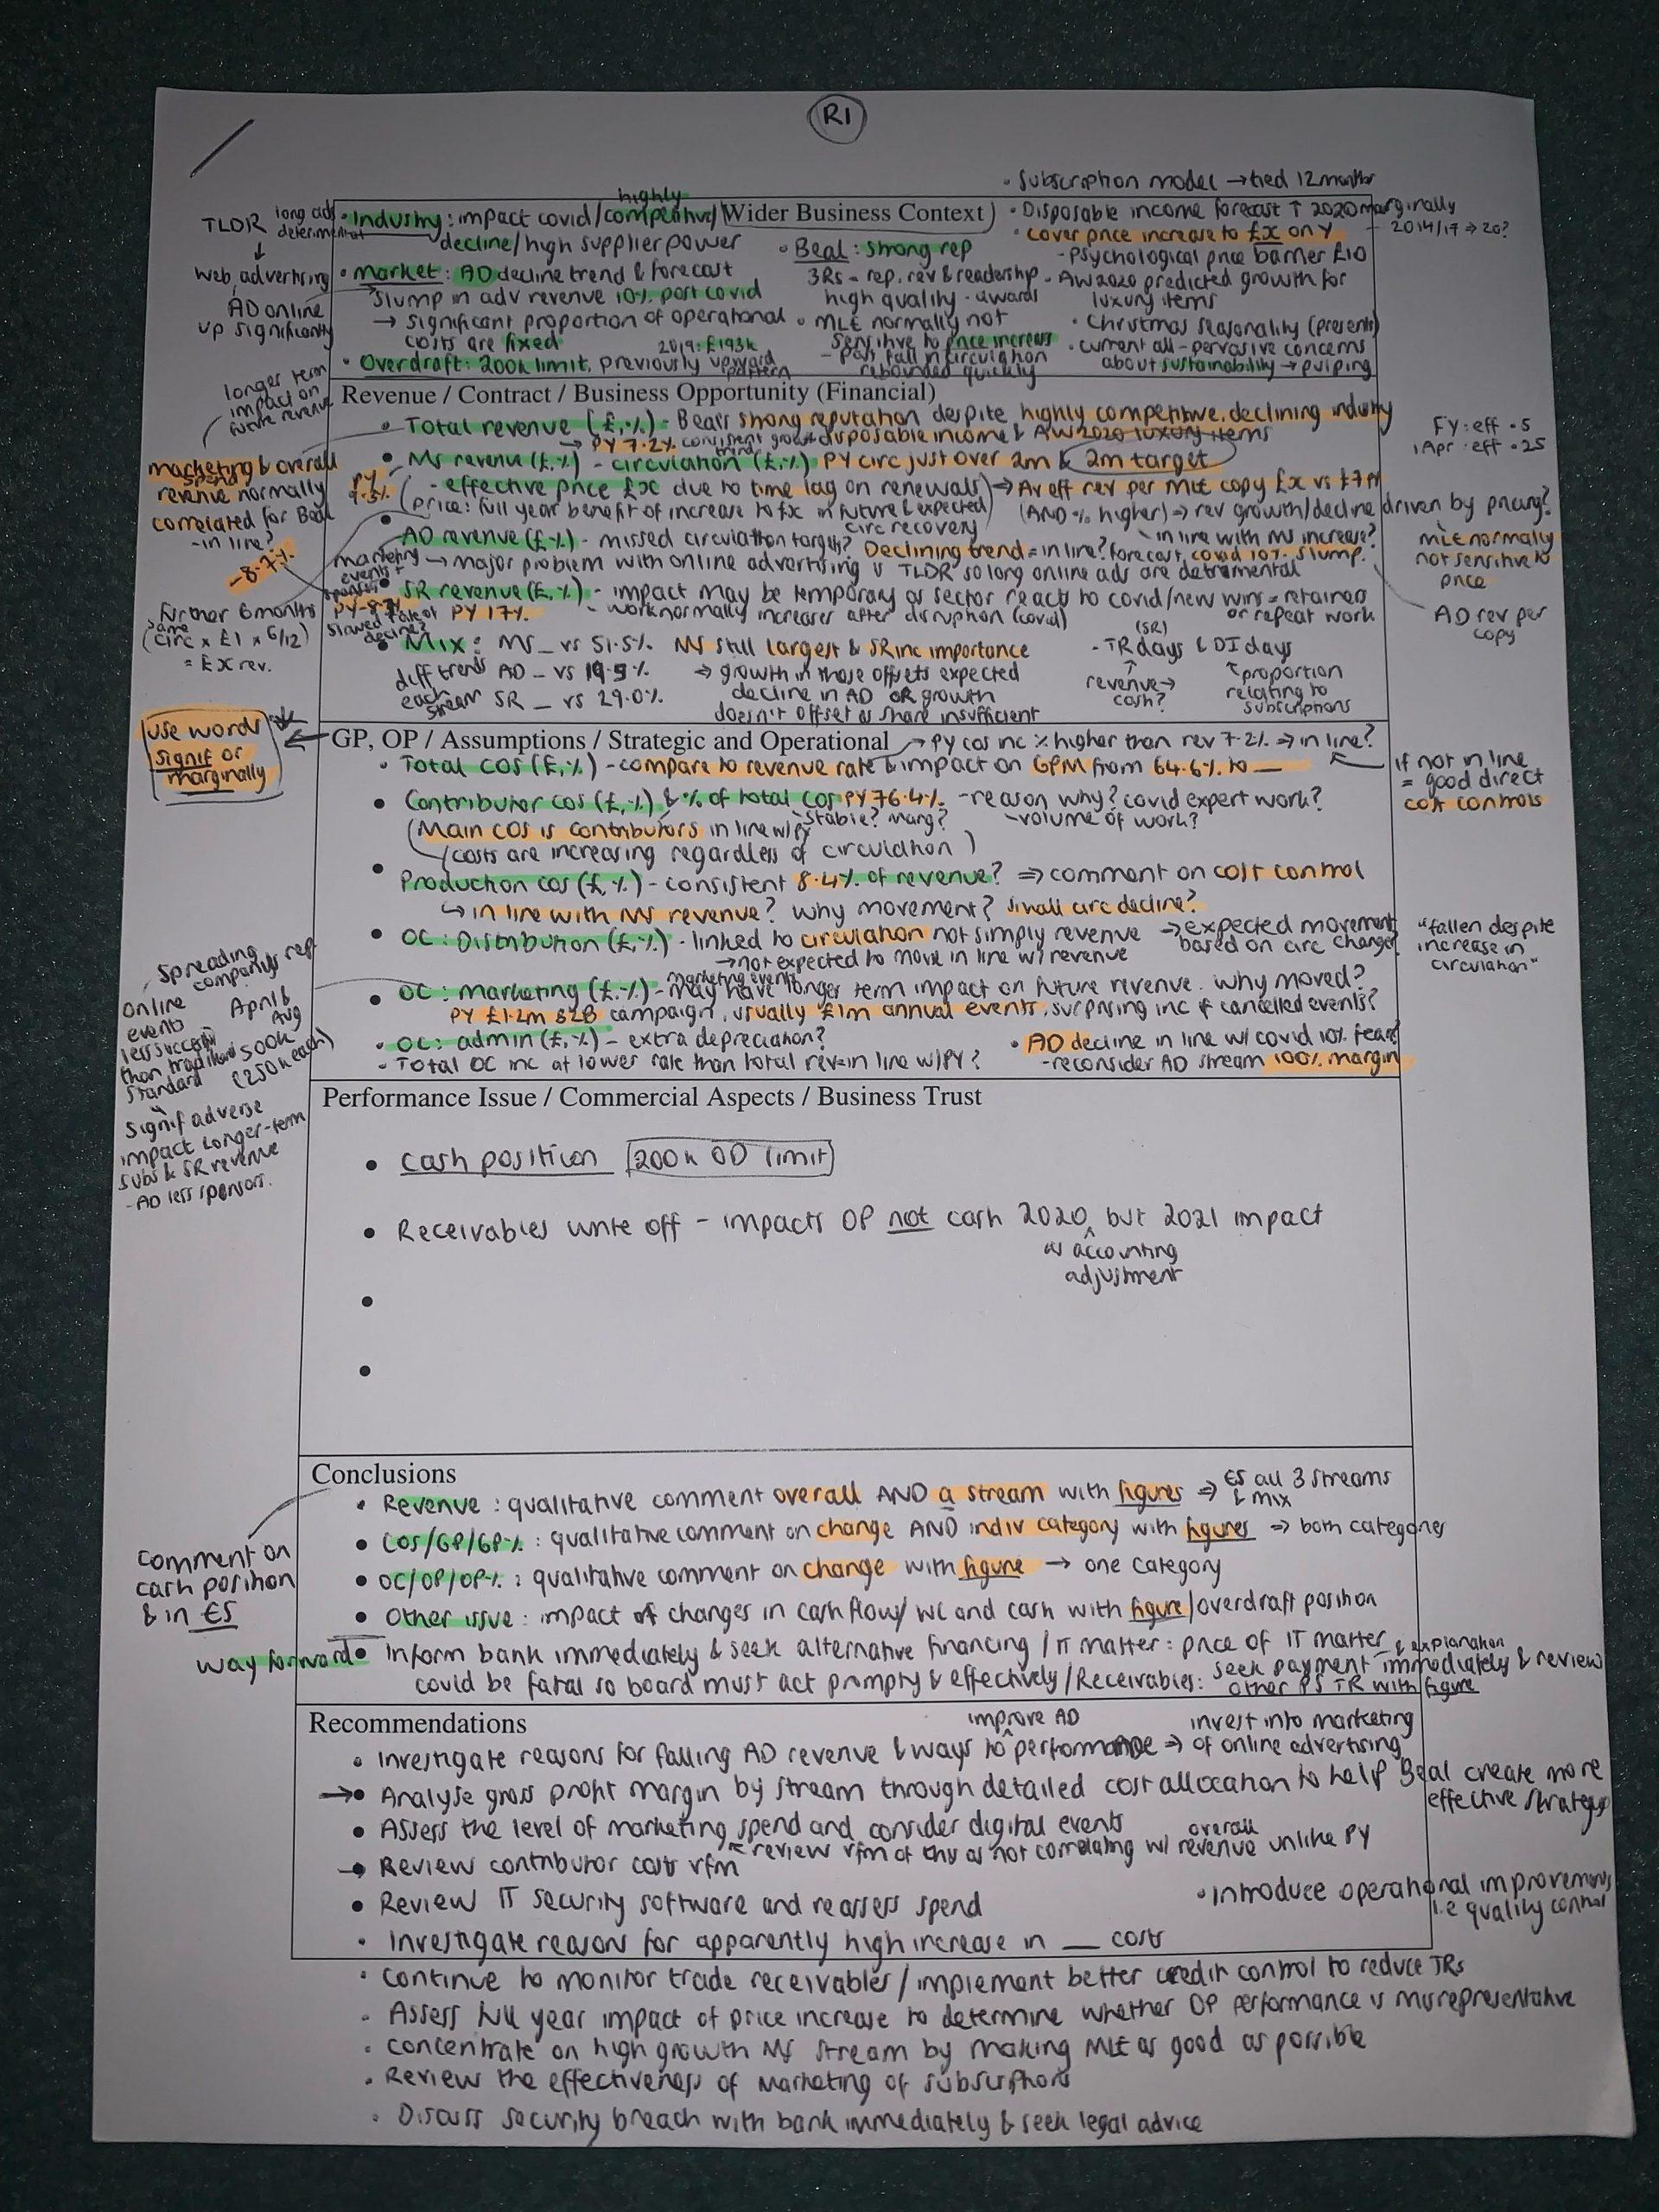 ACA Case Study R1 Planning Sheet